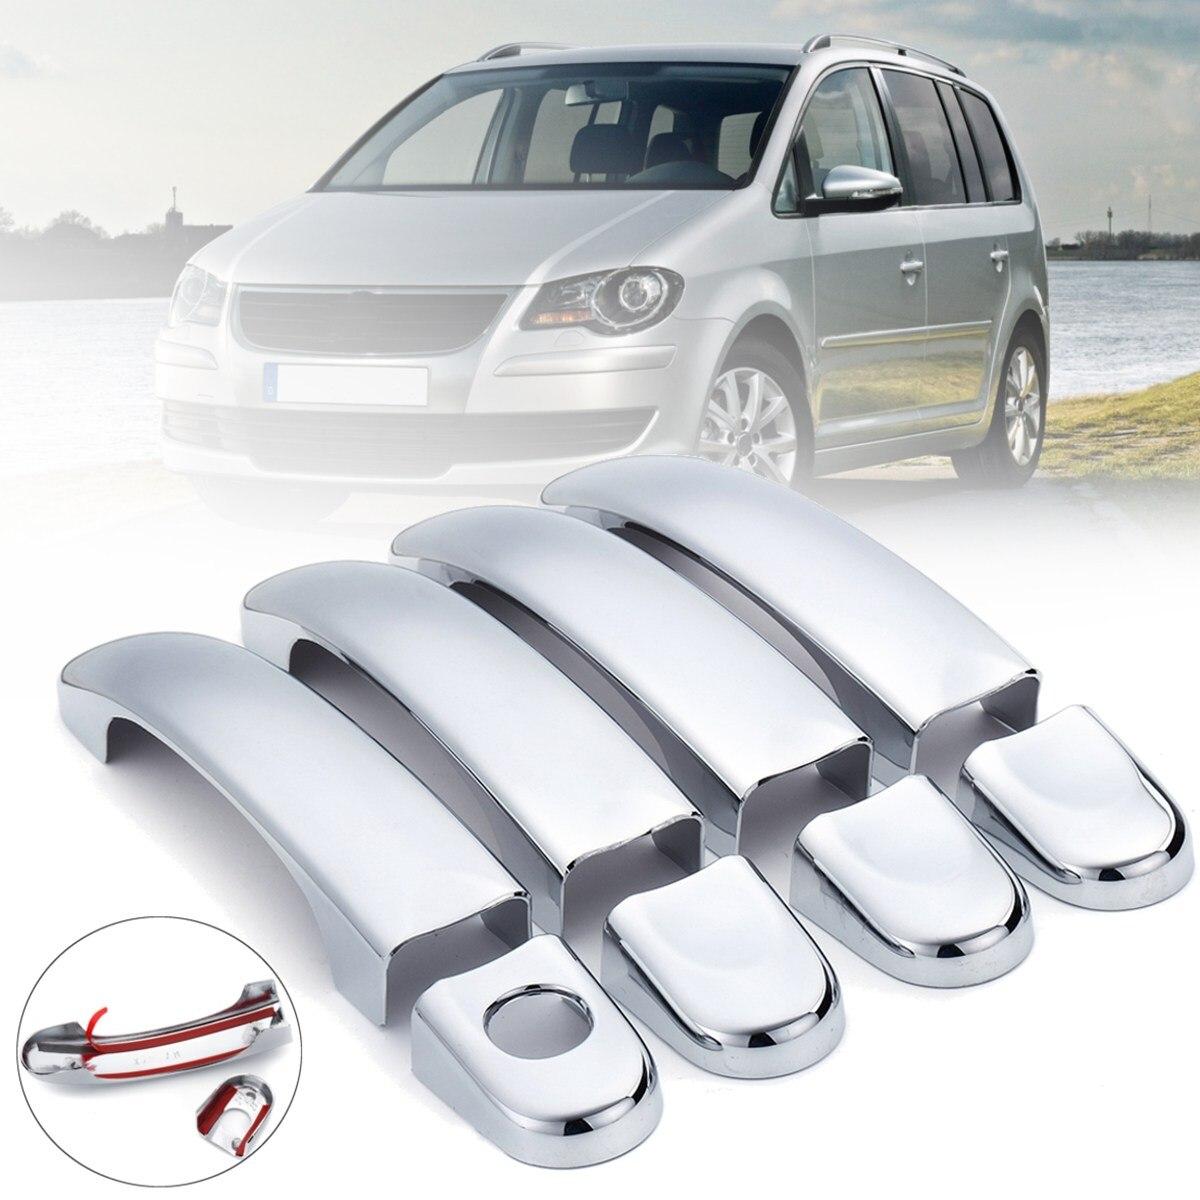 8pcs ABS Chrome Door Handle Covers Trim For VW Touran/Caddy/Multivan 2003 2004 2005 2006 2007 2008 2009 2010 2011 2012 2013